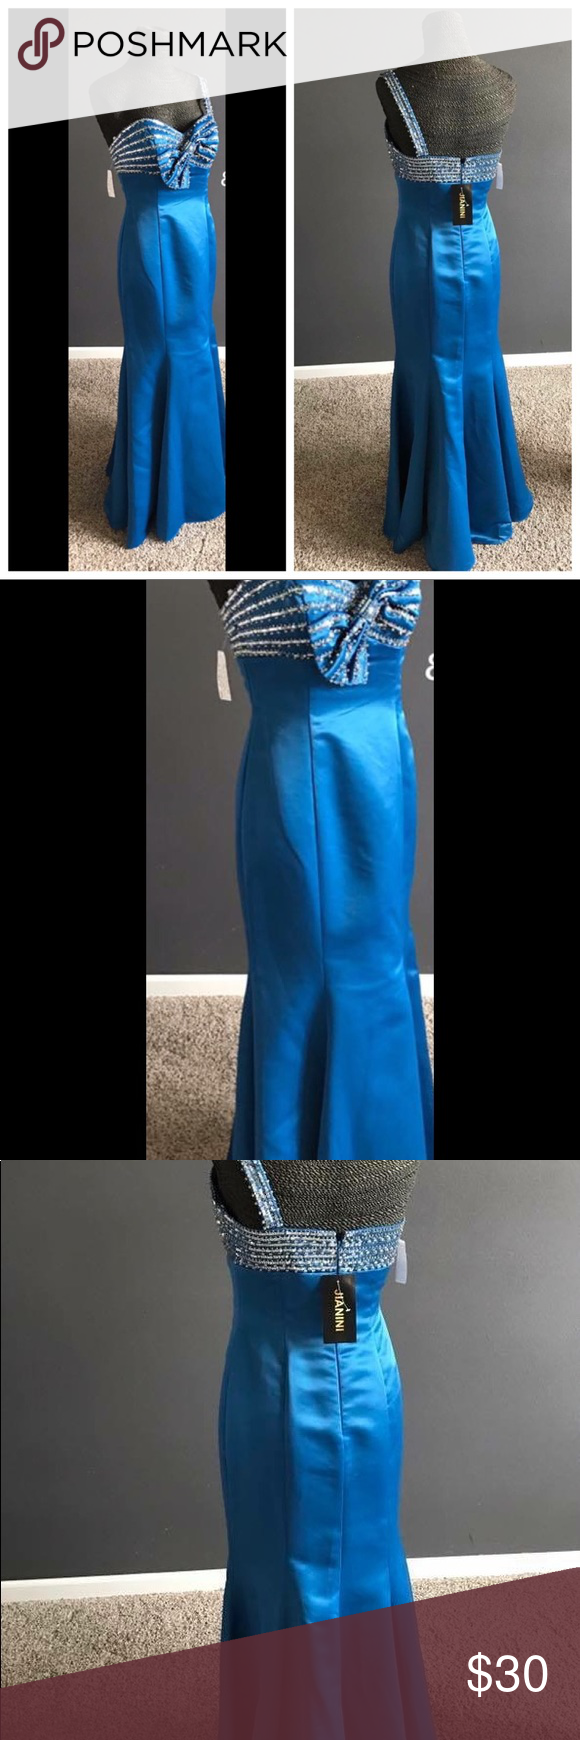 Jainini Gown Sz 4 Dark blue off center bow one strap -Beautiful and unique gown trumpet fit jainini Dresses Prom